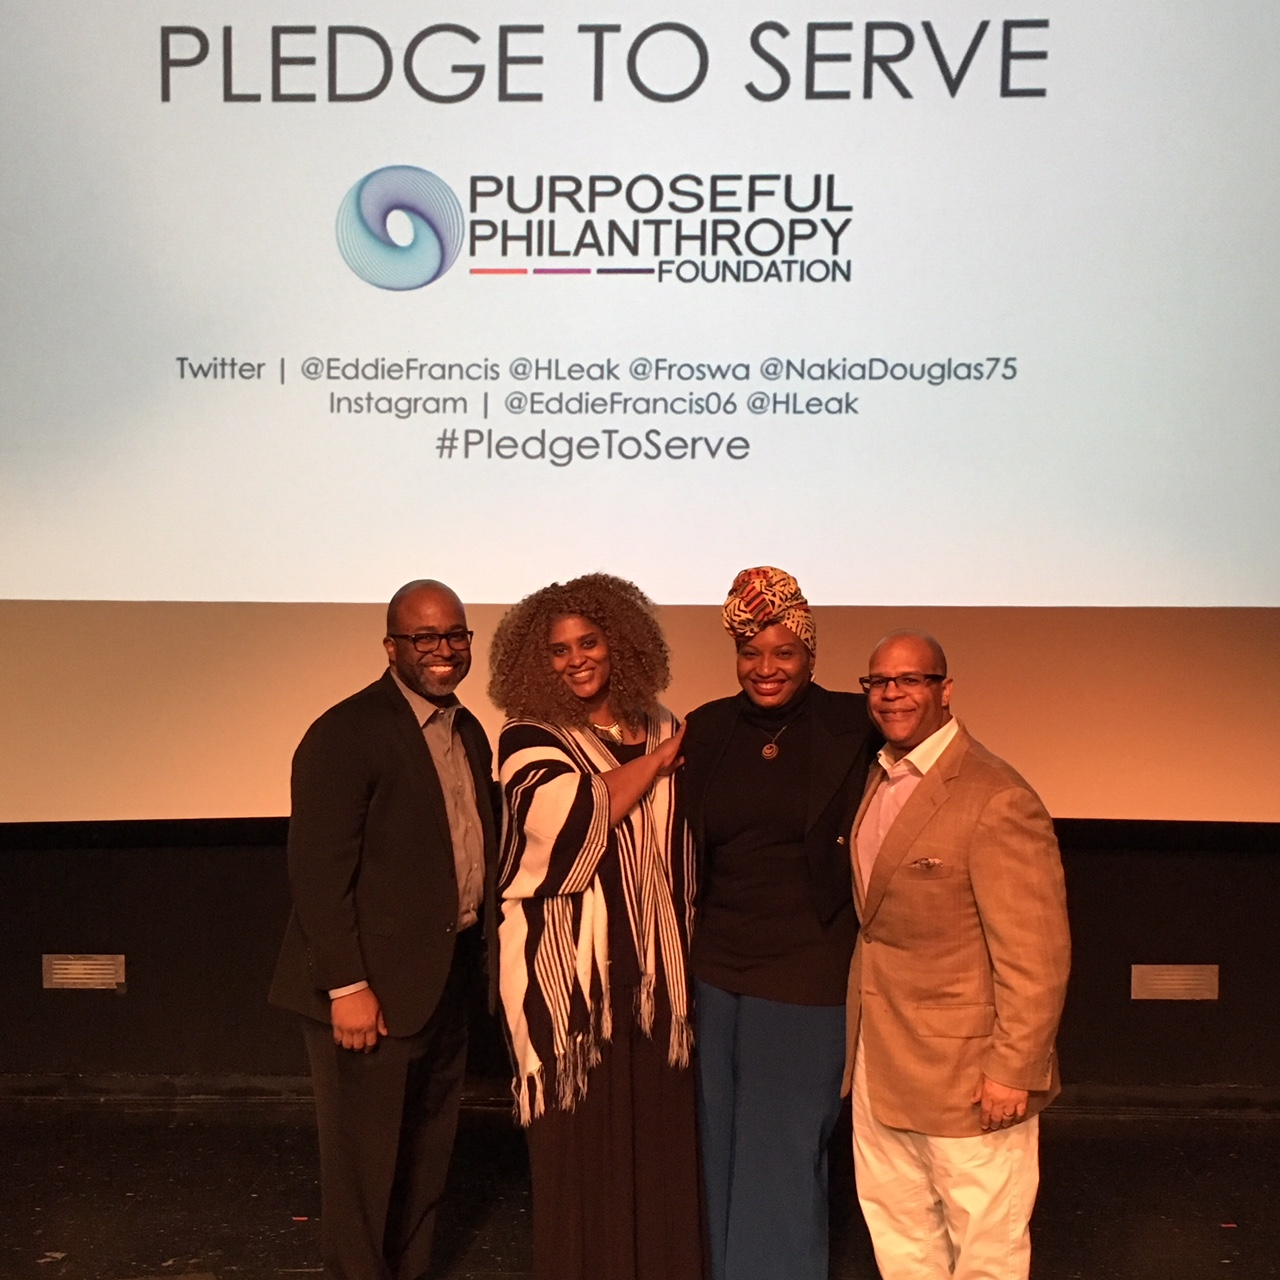 Pledge to Serve speakers Nakia Douglas, Froswa' Booker-Drew, Halima Leak Francis, and Eddie Francis